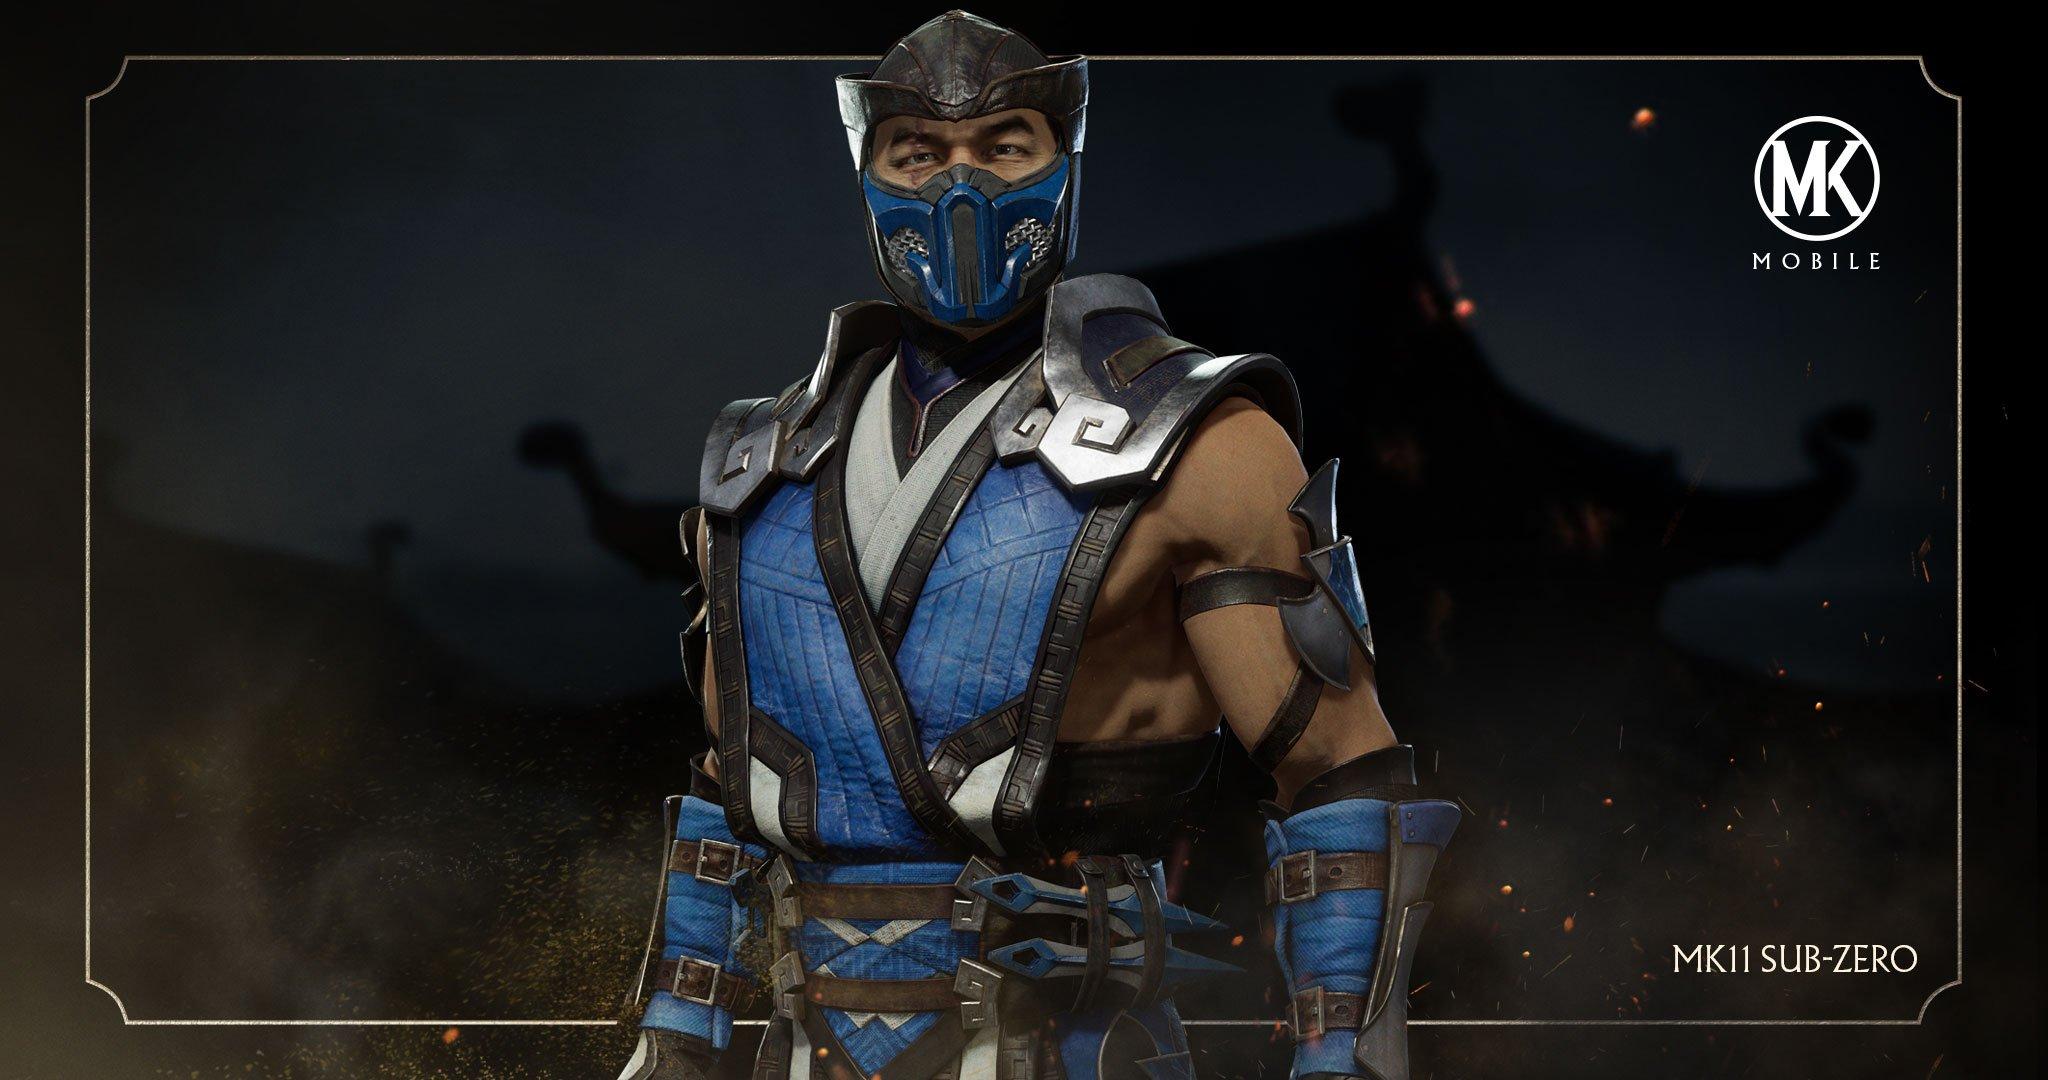 Mortal Kombat 11 Sub-Zero Coming to MK Mobile - Mortal